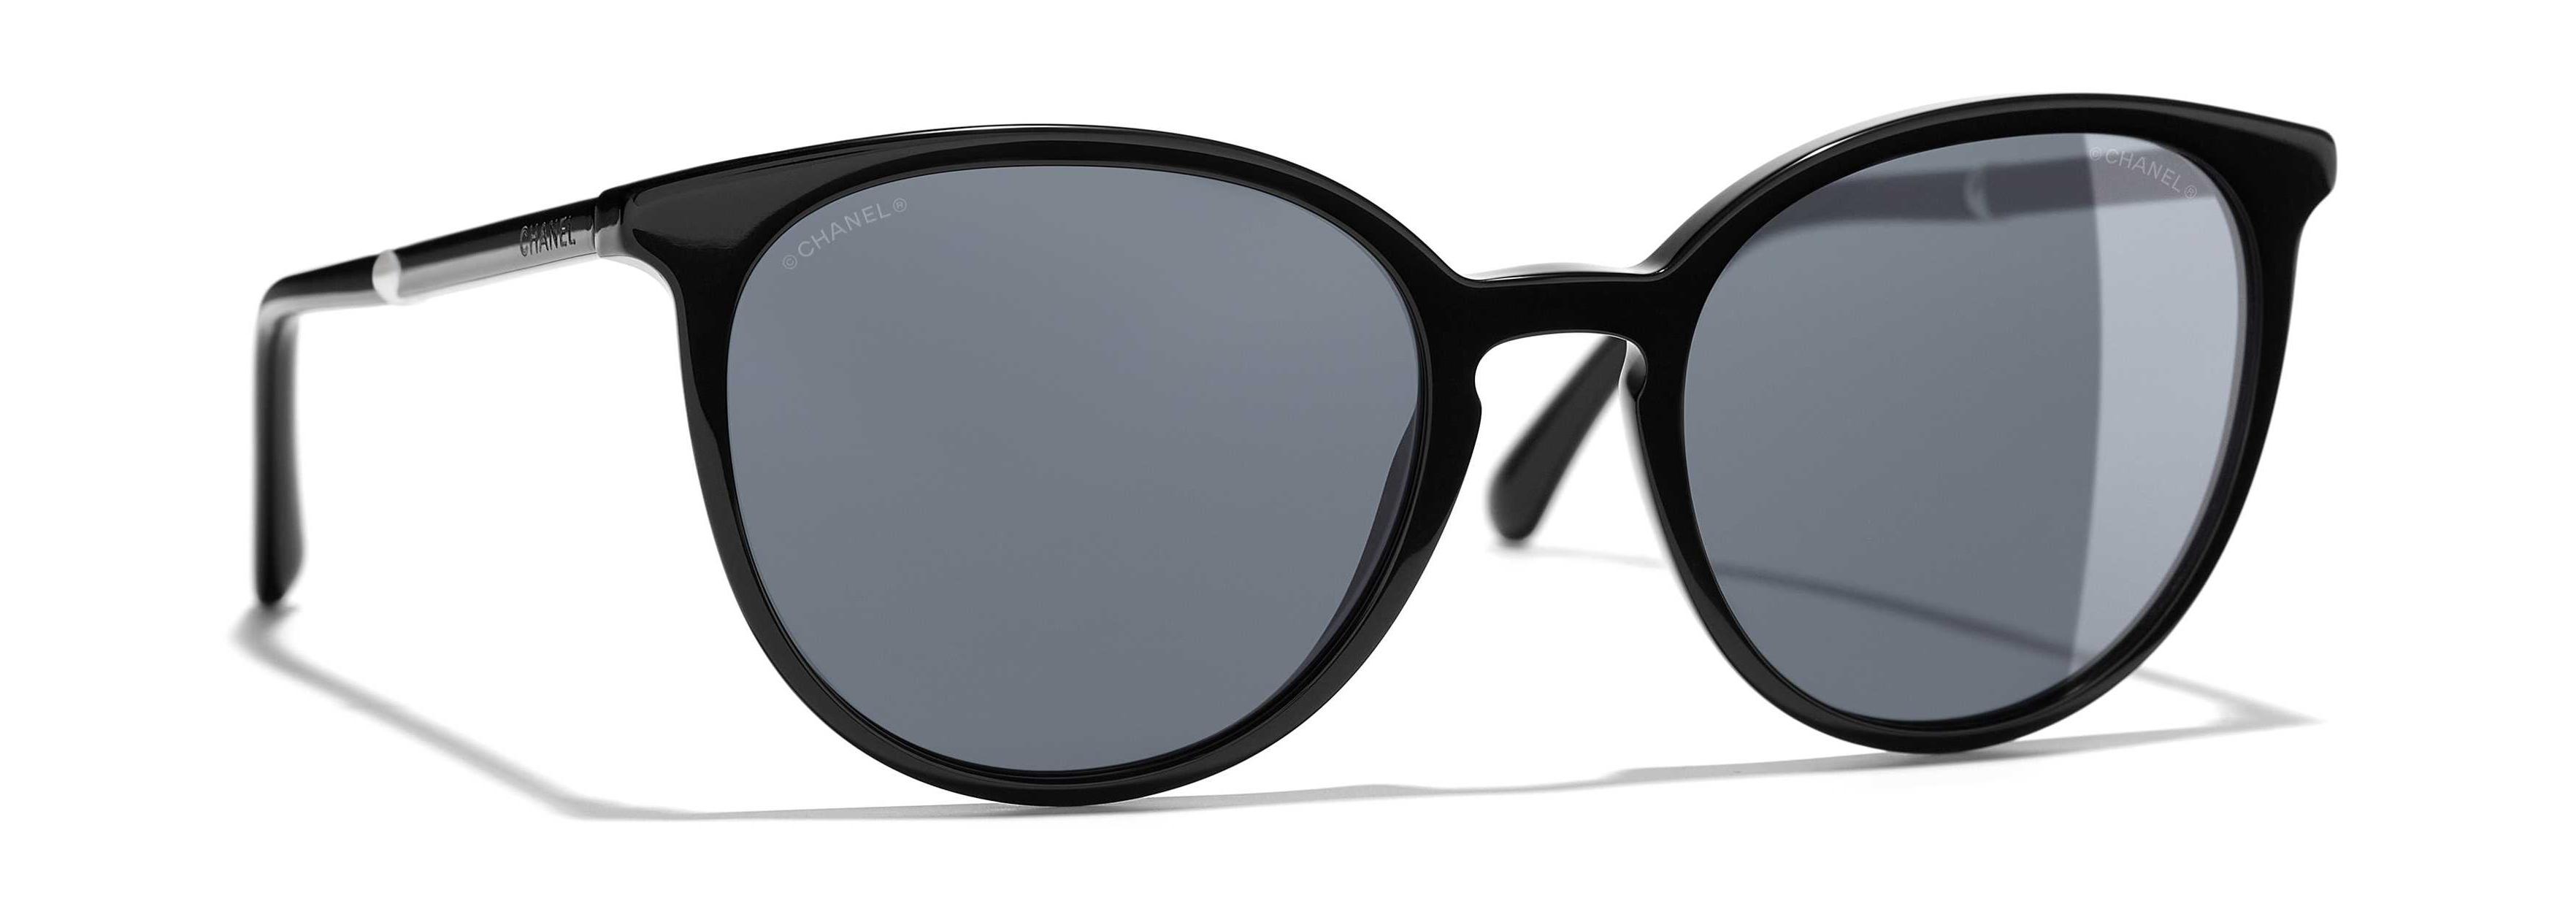 Sunglasses Women CHANEL CH 5394H C501S6 53/19